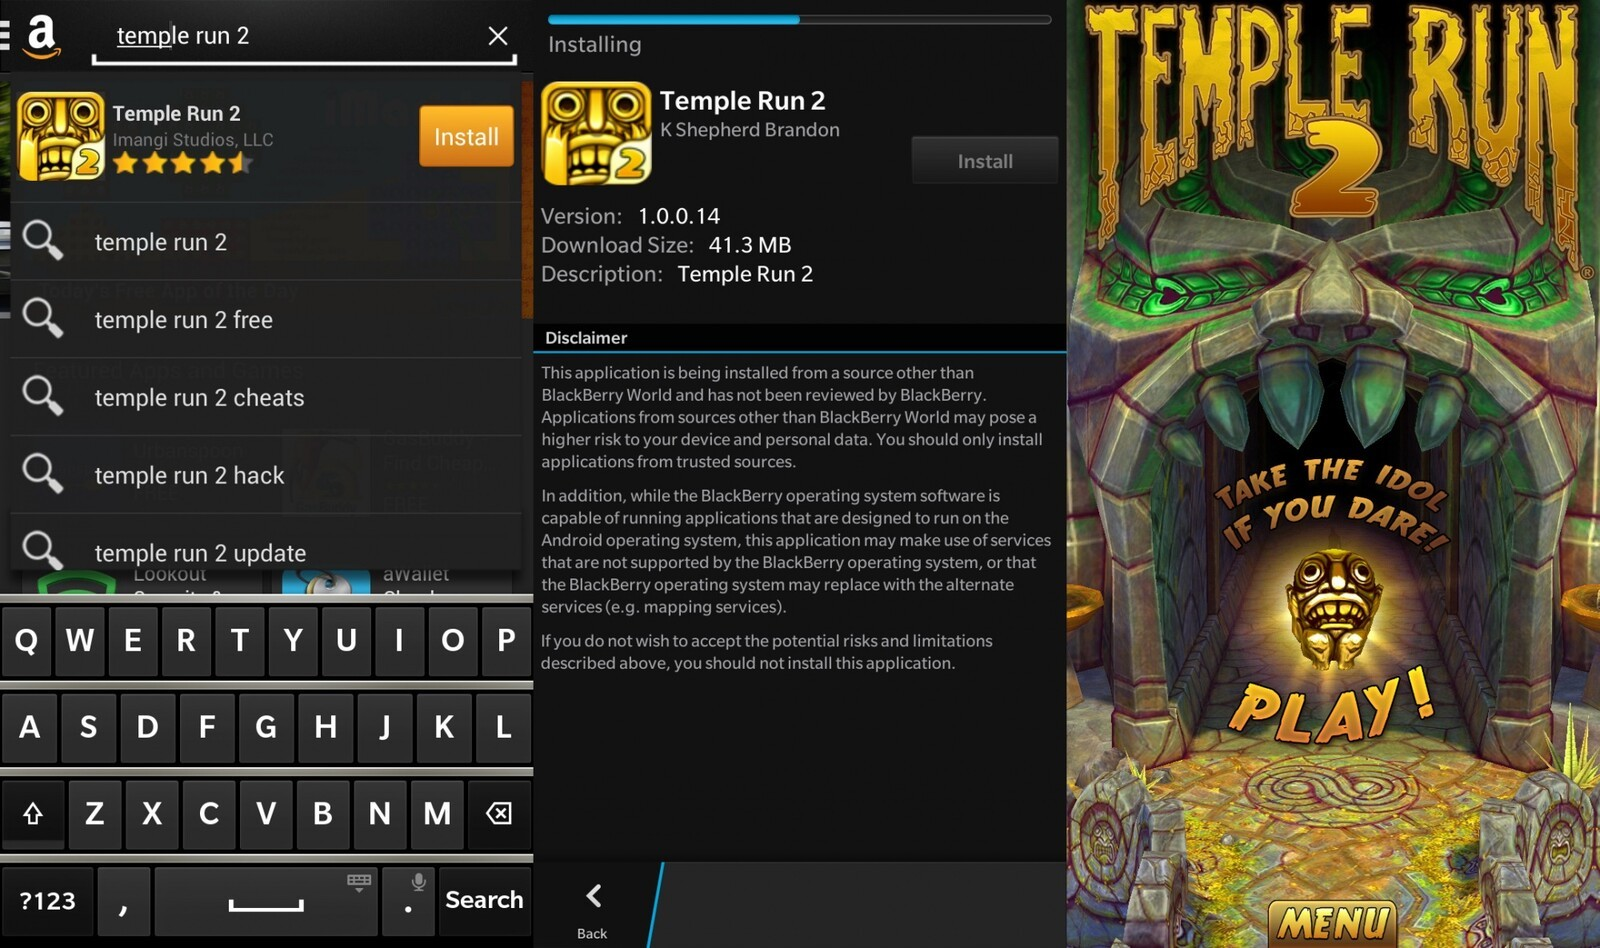 temple run 2 blackberry download